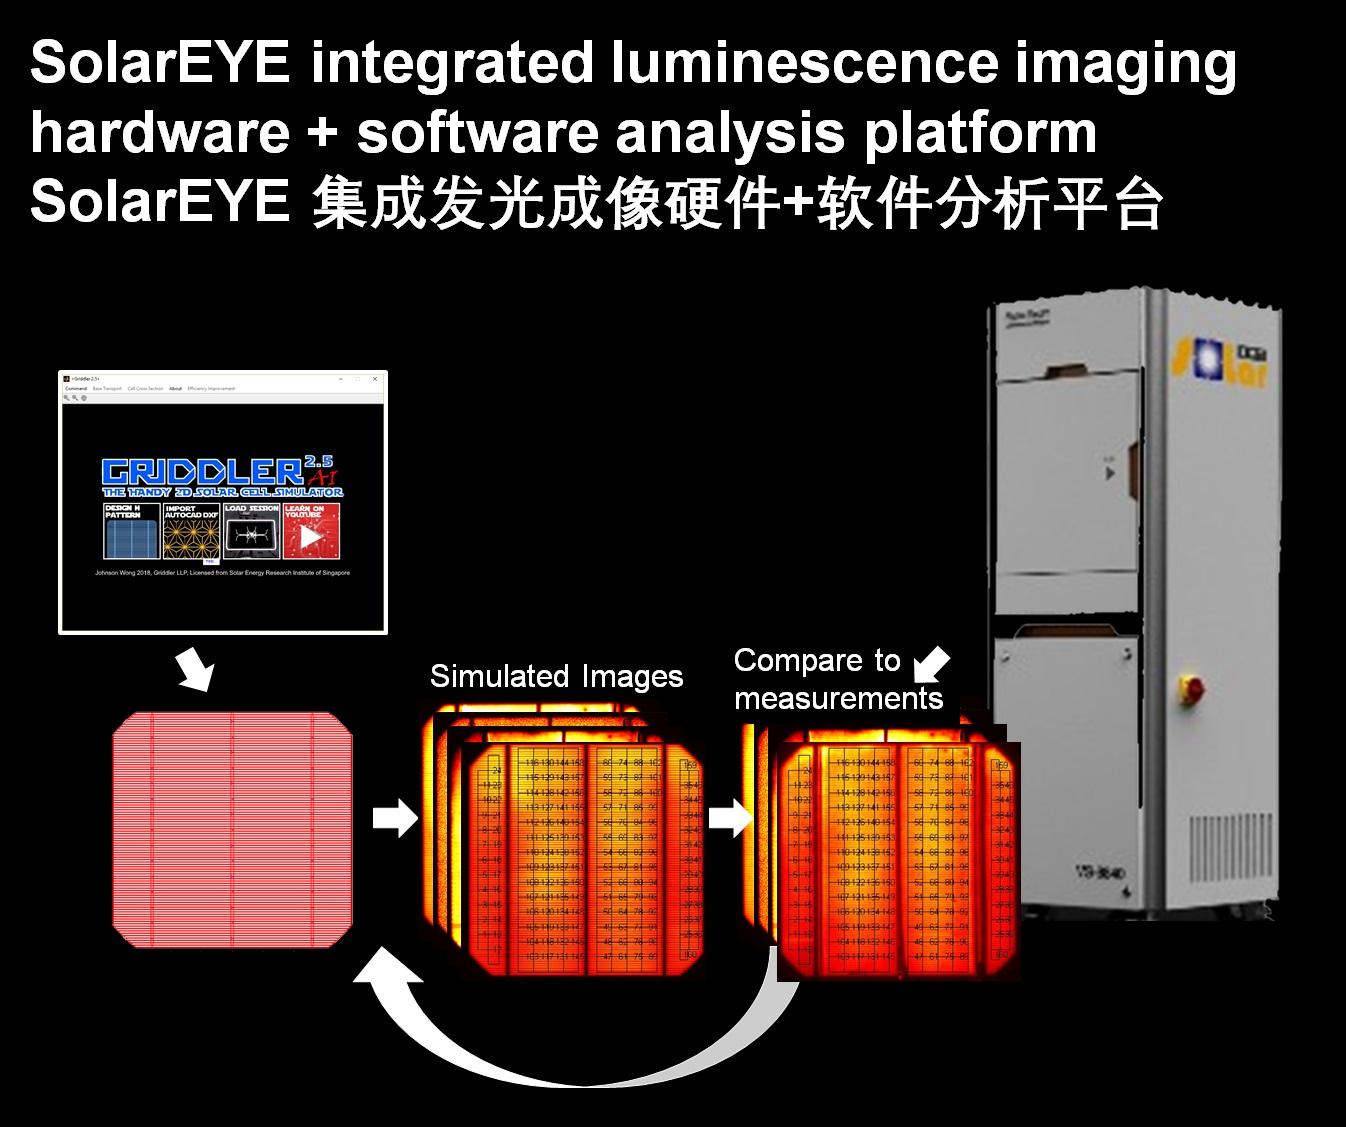 SolarEYE: Integrated Luminescence Imaging Hardware + Software Analysis Platform